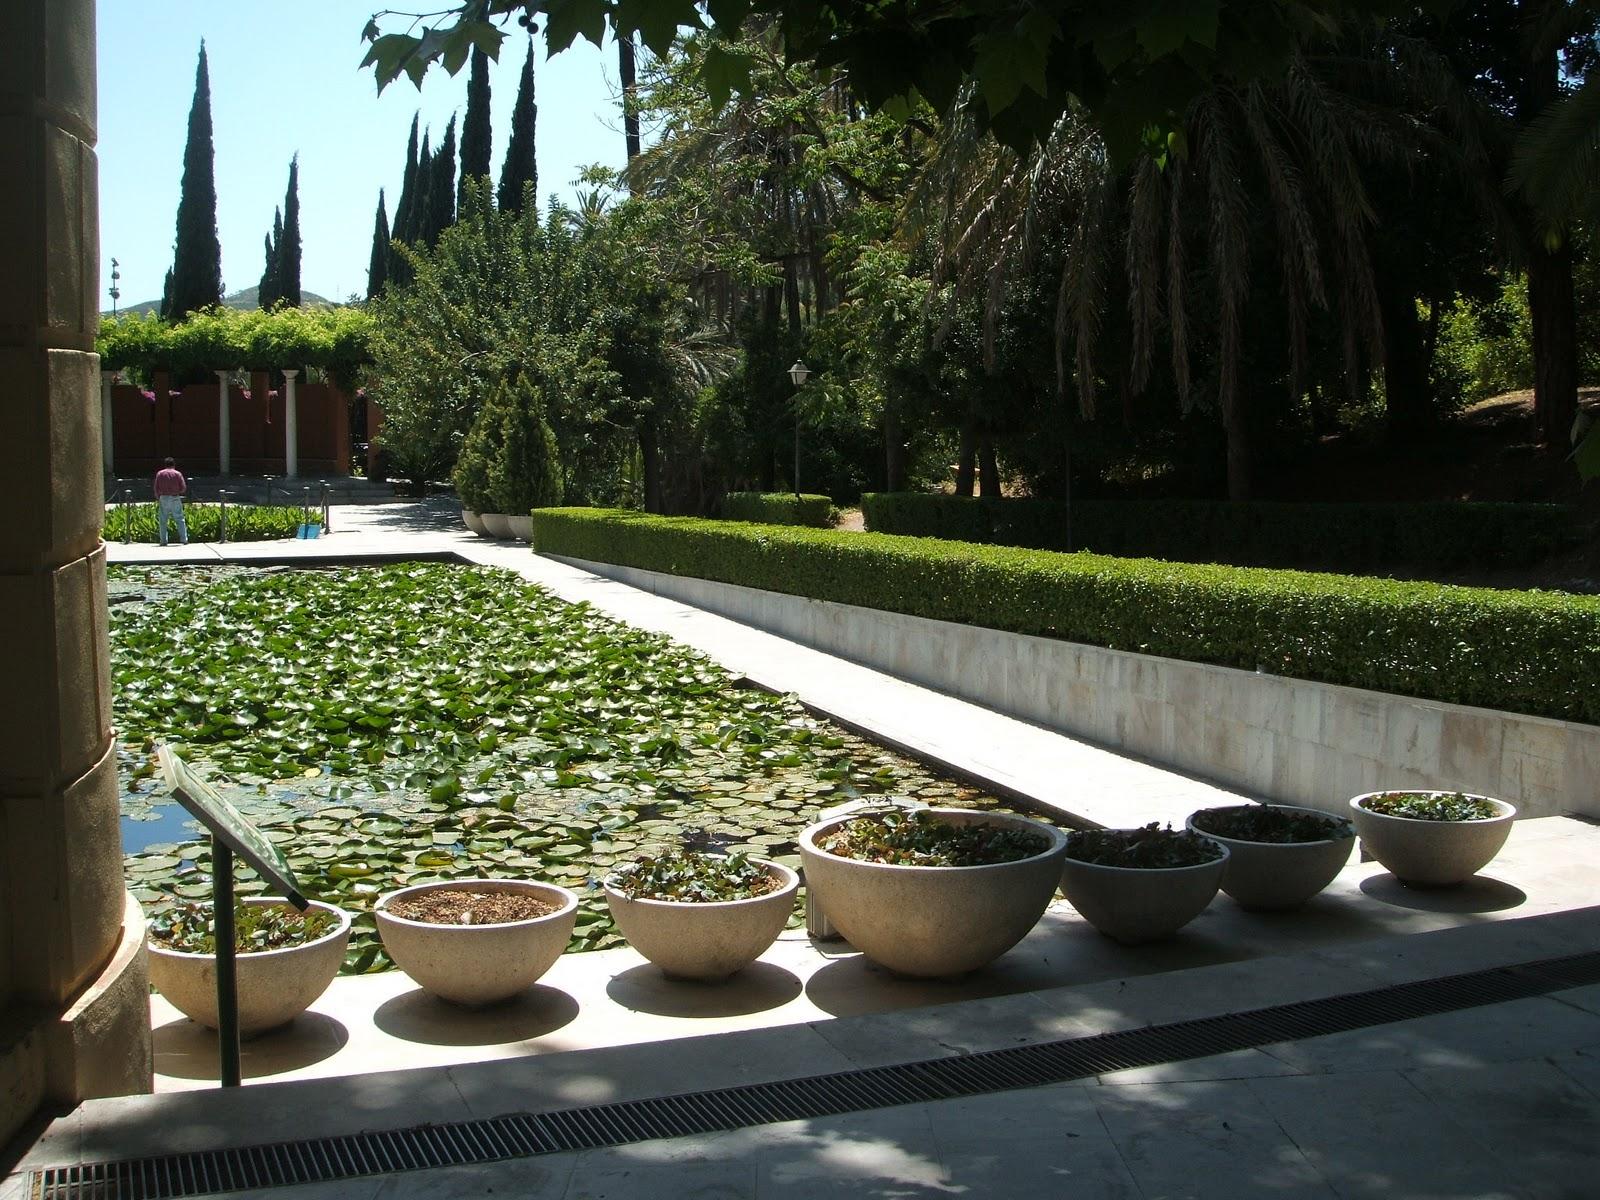 Garden tour en m laga la concepci n paisaje libre for Jardin de la conception malaga